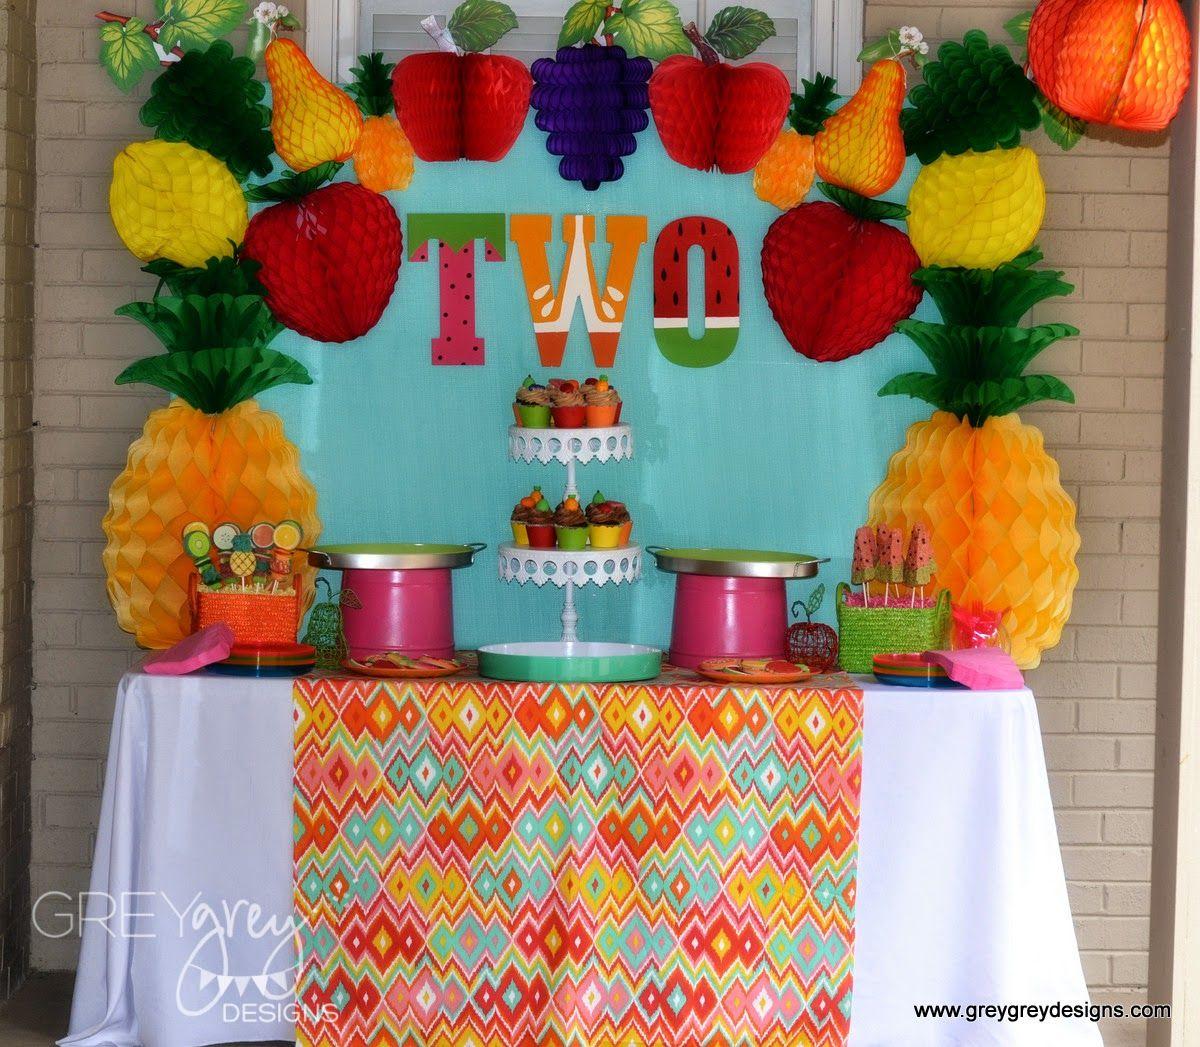 GreyGrey Designs: {My Parties} Avery's Two-tti Fruitti